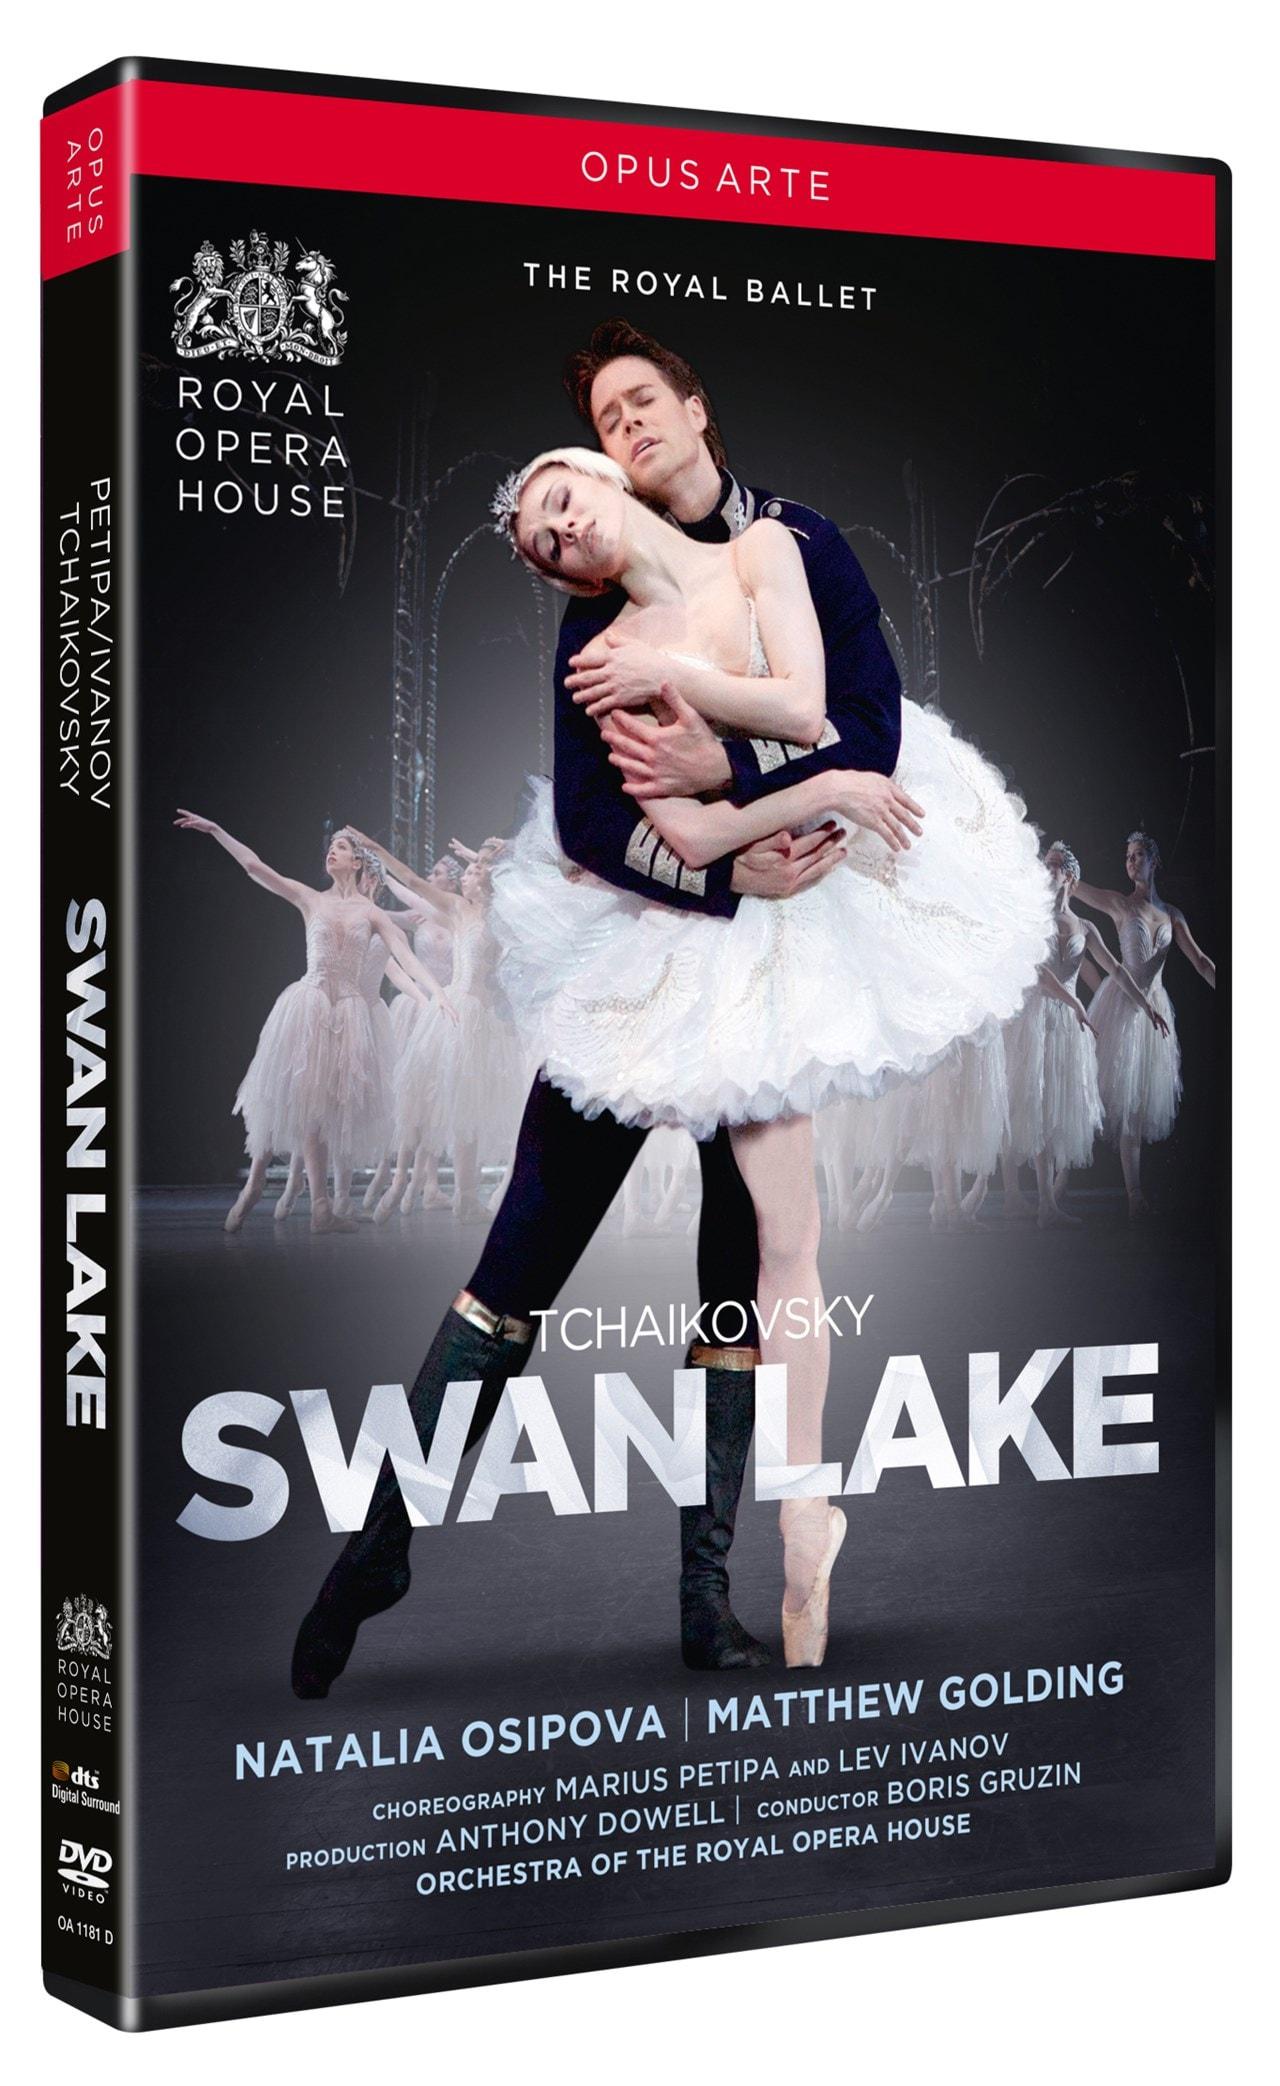 Swan Lake: The Royal Ballet - 2